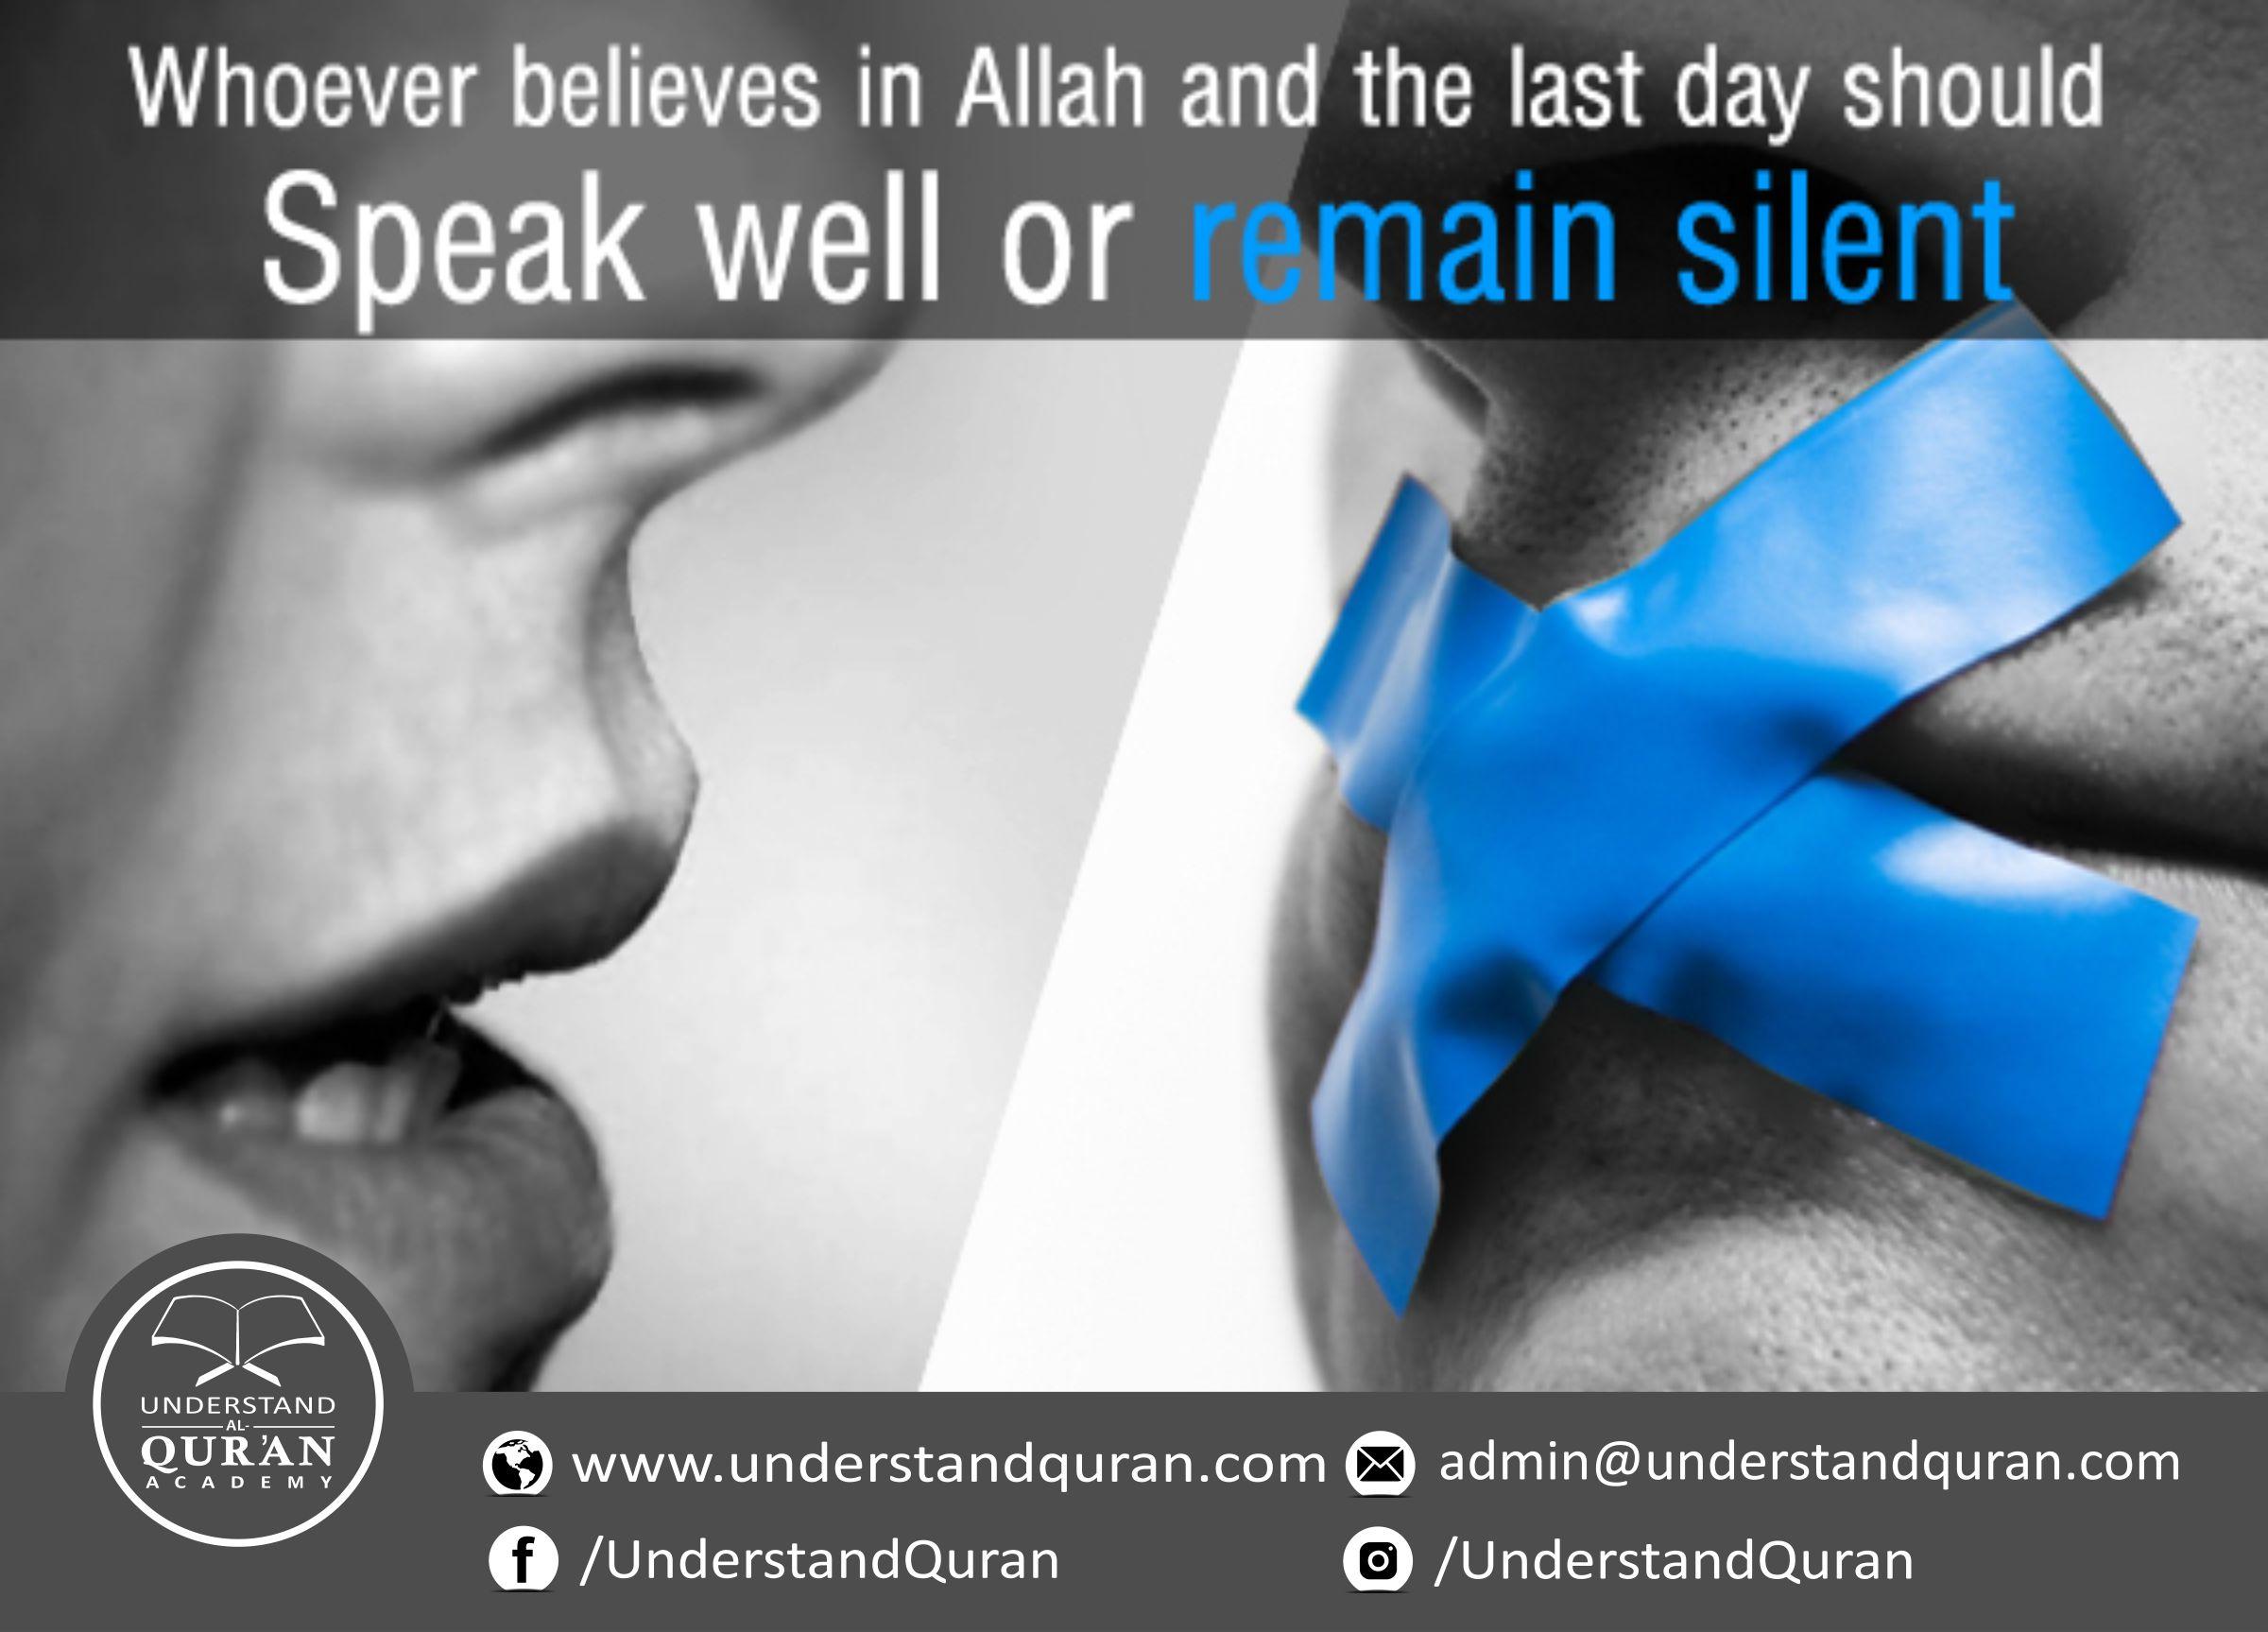 How to speak: more beautiful or beautiful